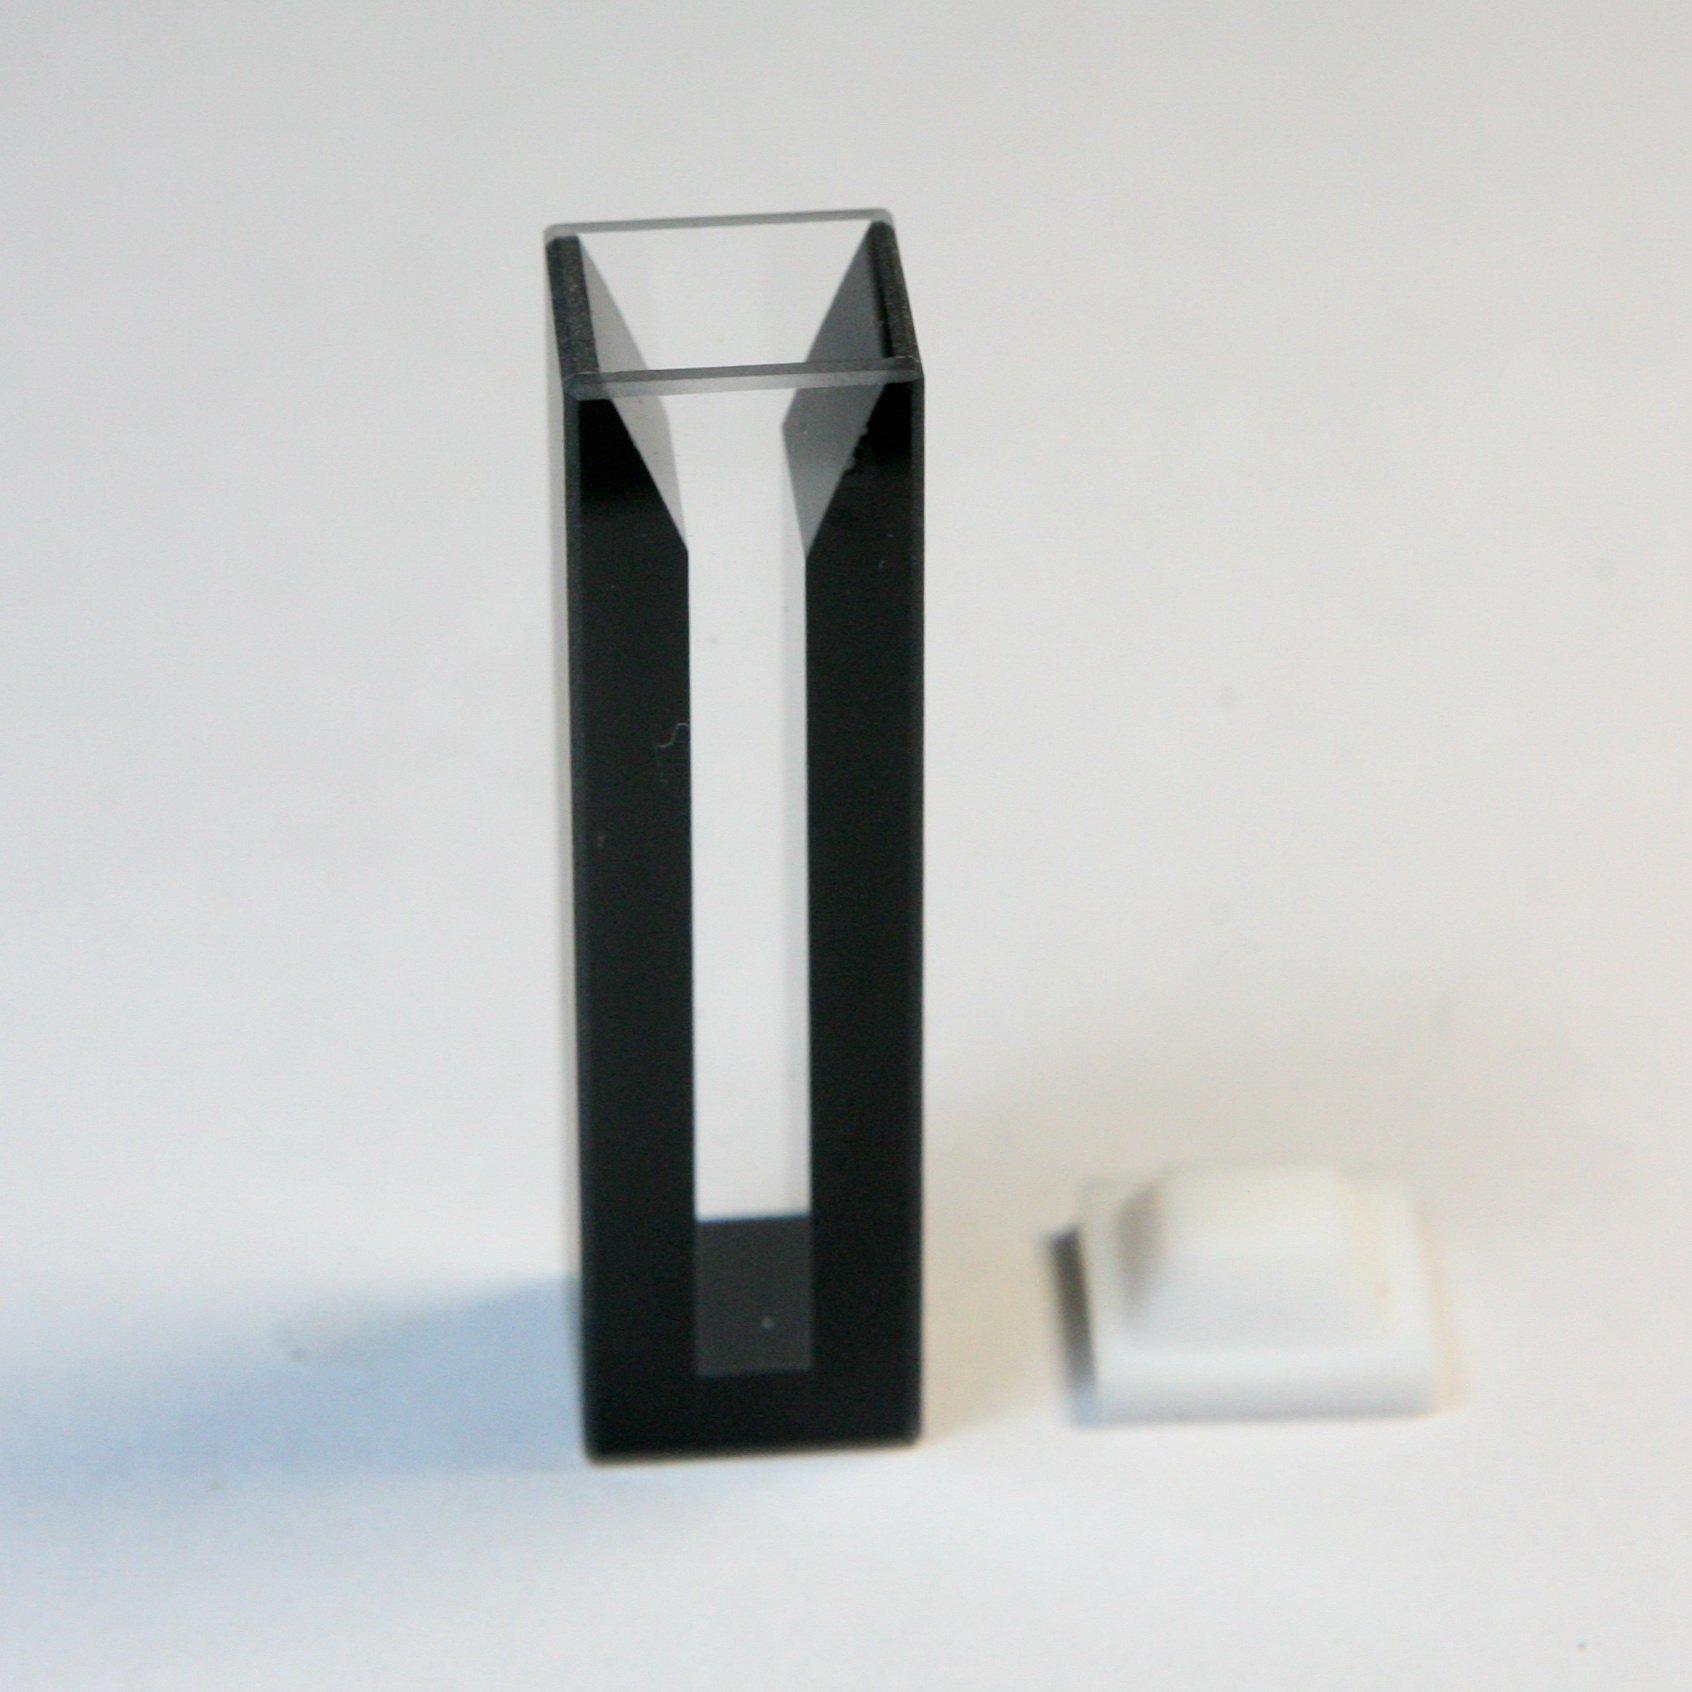 Micro Quartz Cuvette, Black Wall, 10mm Lightpath, 1.75ml, 5mm Slit, Cuvettes,cell